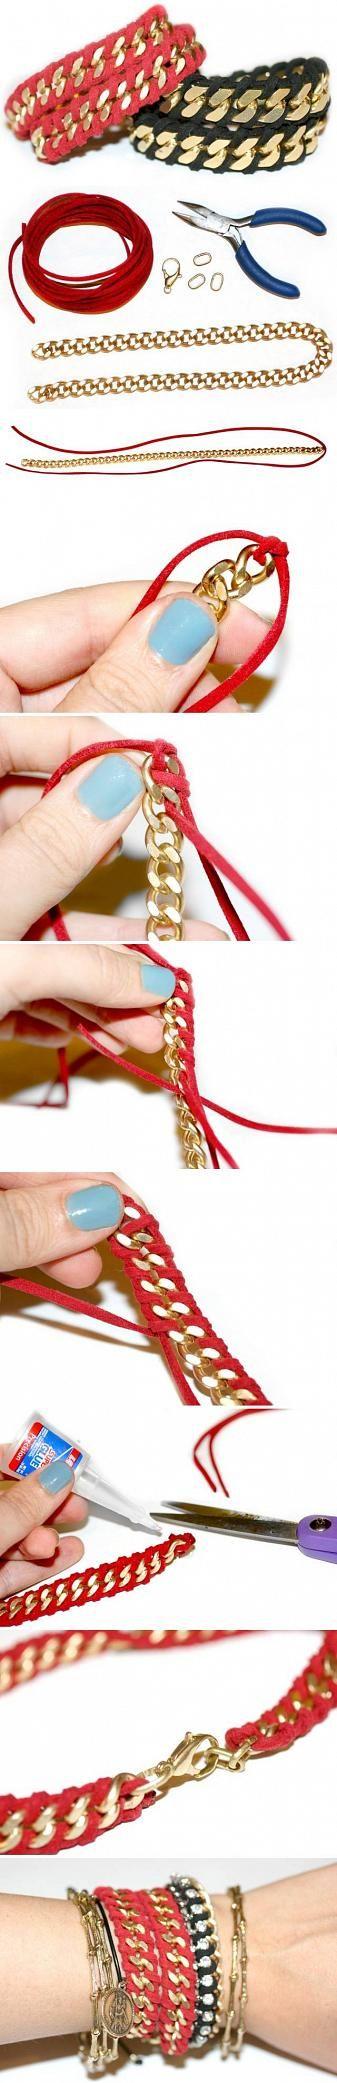 Homemade Accessories Creative Inspiring Ideas - Fashion Diva Design